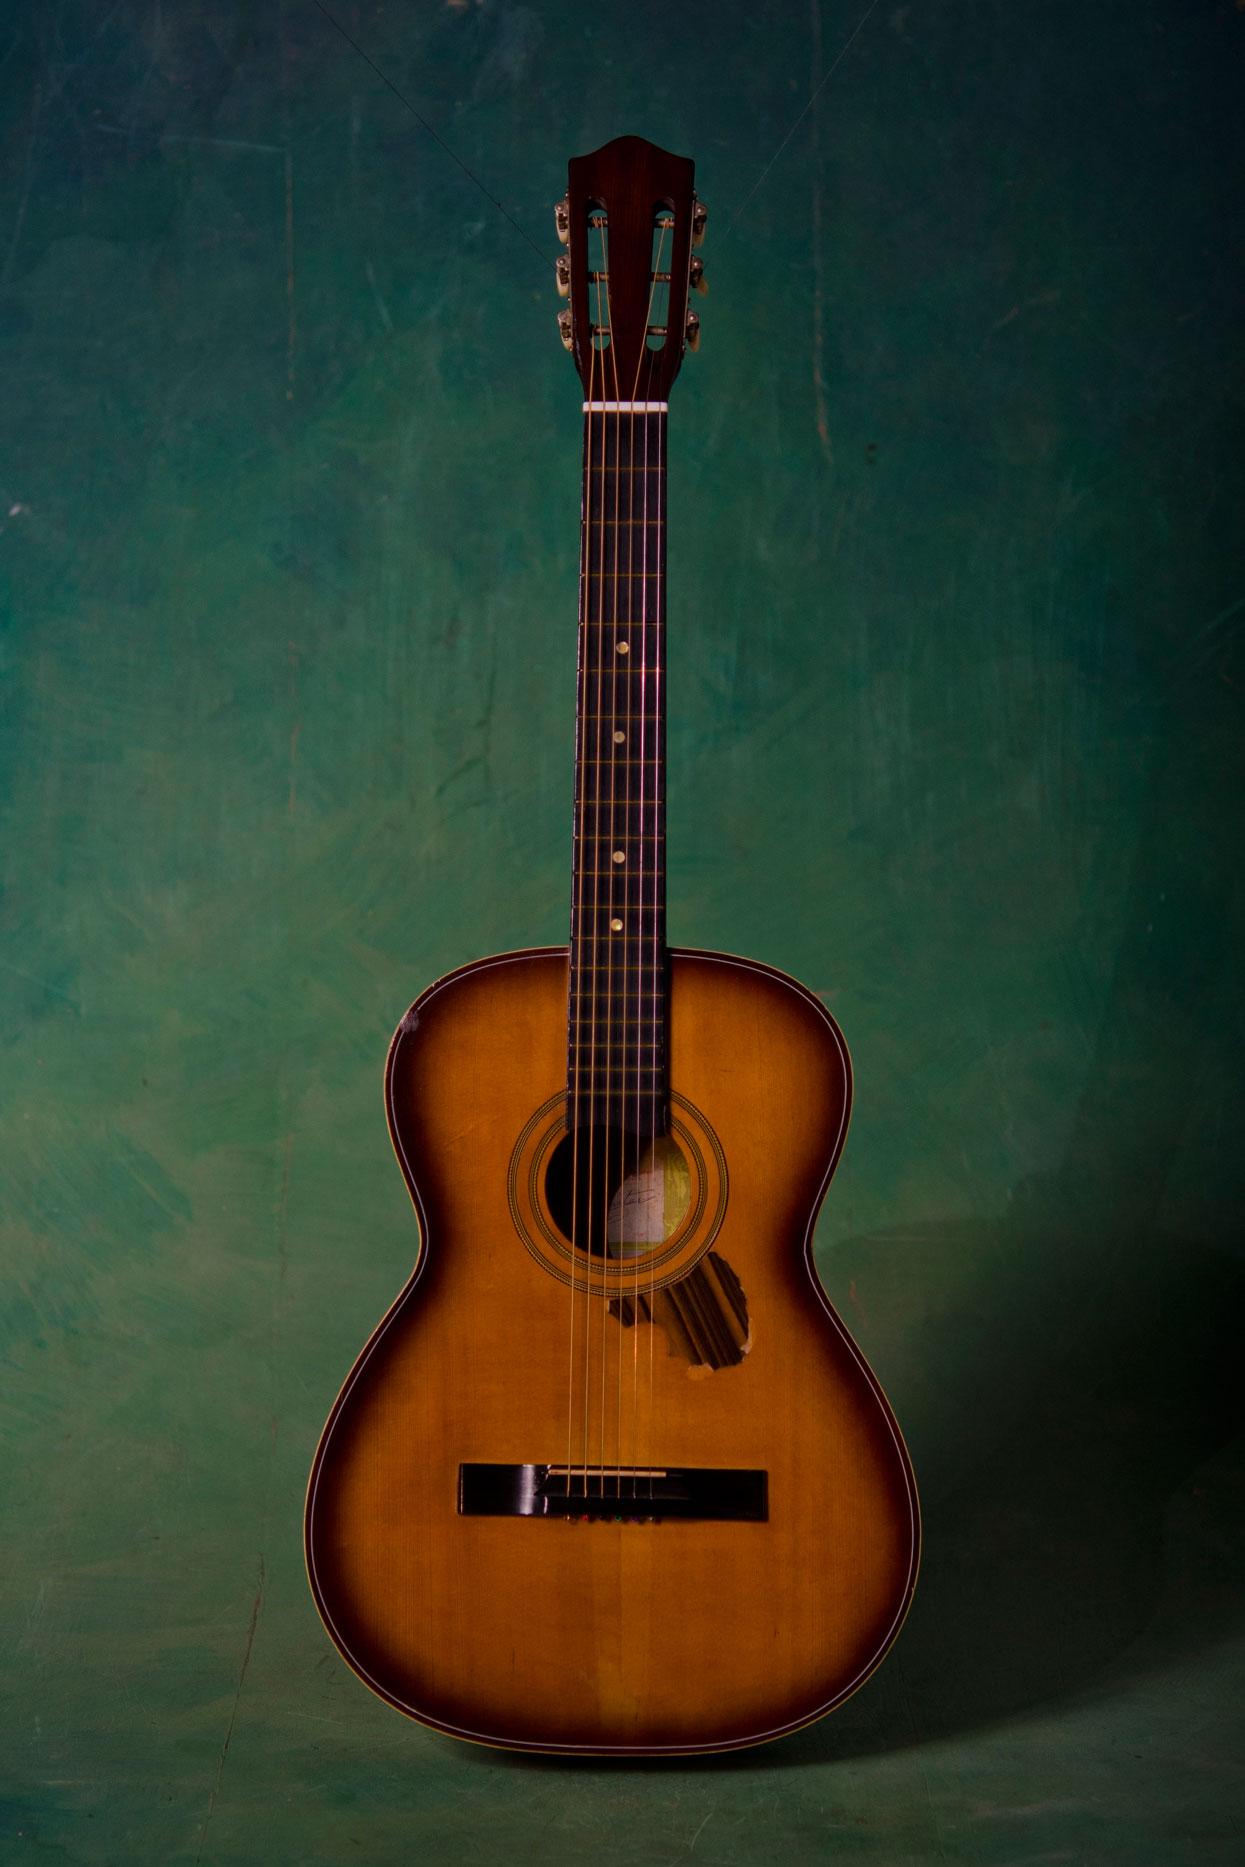 Acoustic Vintage Japan กีต้าร์โปร่งมือสอง